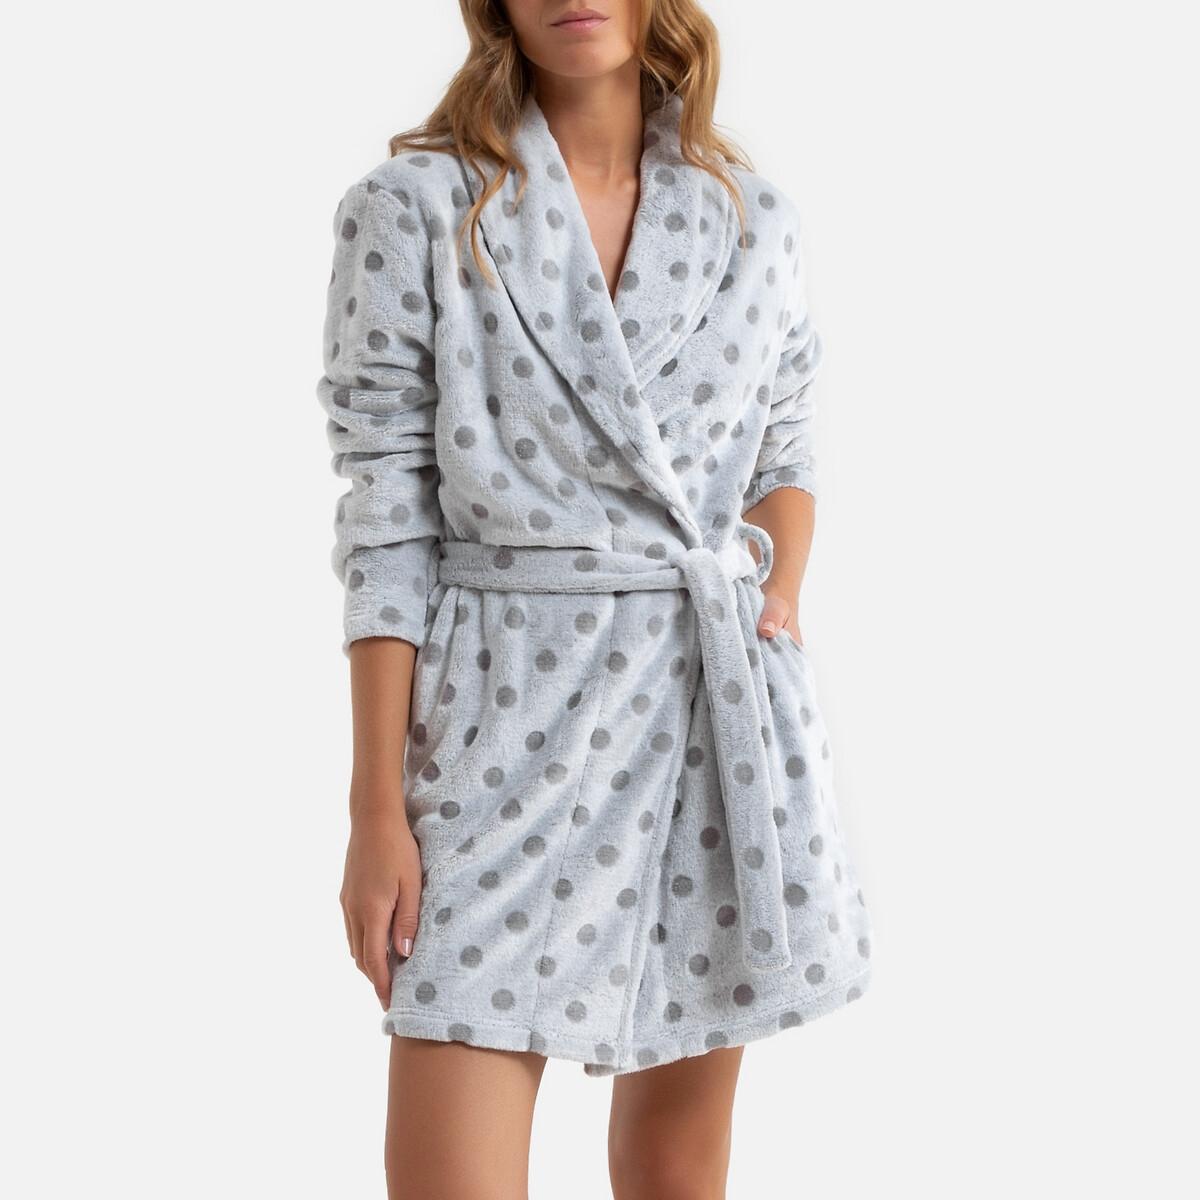 Халат LaRedoute La Redoute 54/56 (FR) - 60/62 (RUS) серый пижама la redoute с шортами 54 56 fr 60 62 rus синий